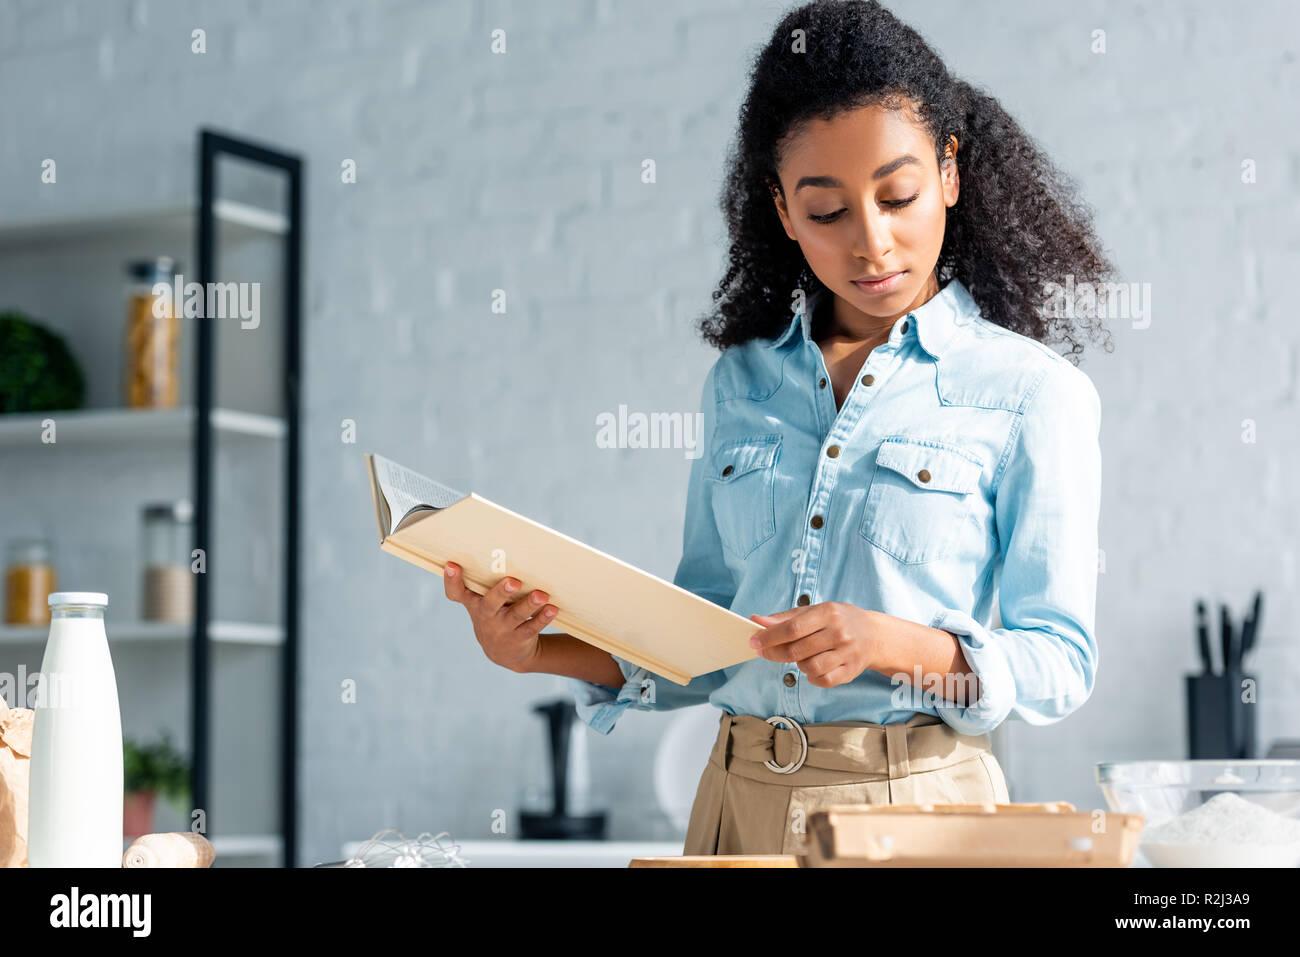 Attraktive African American Girl holding Kochbuch in der Küche Stockbild